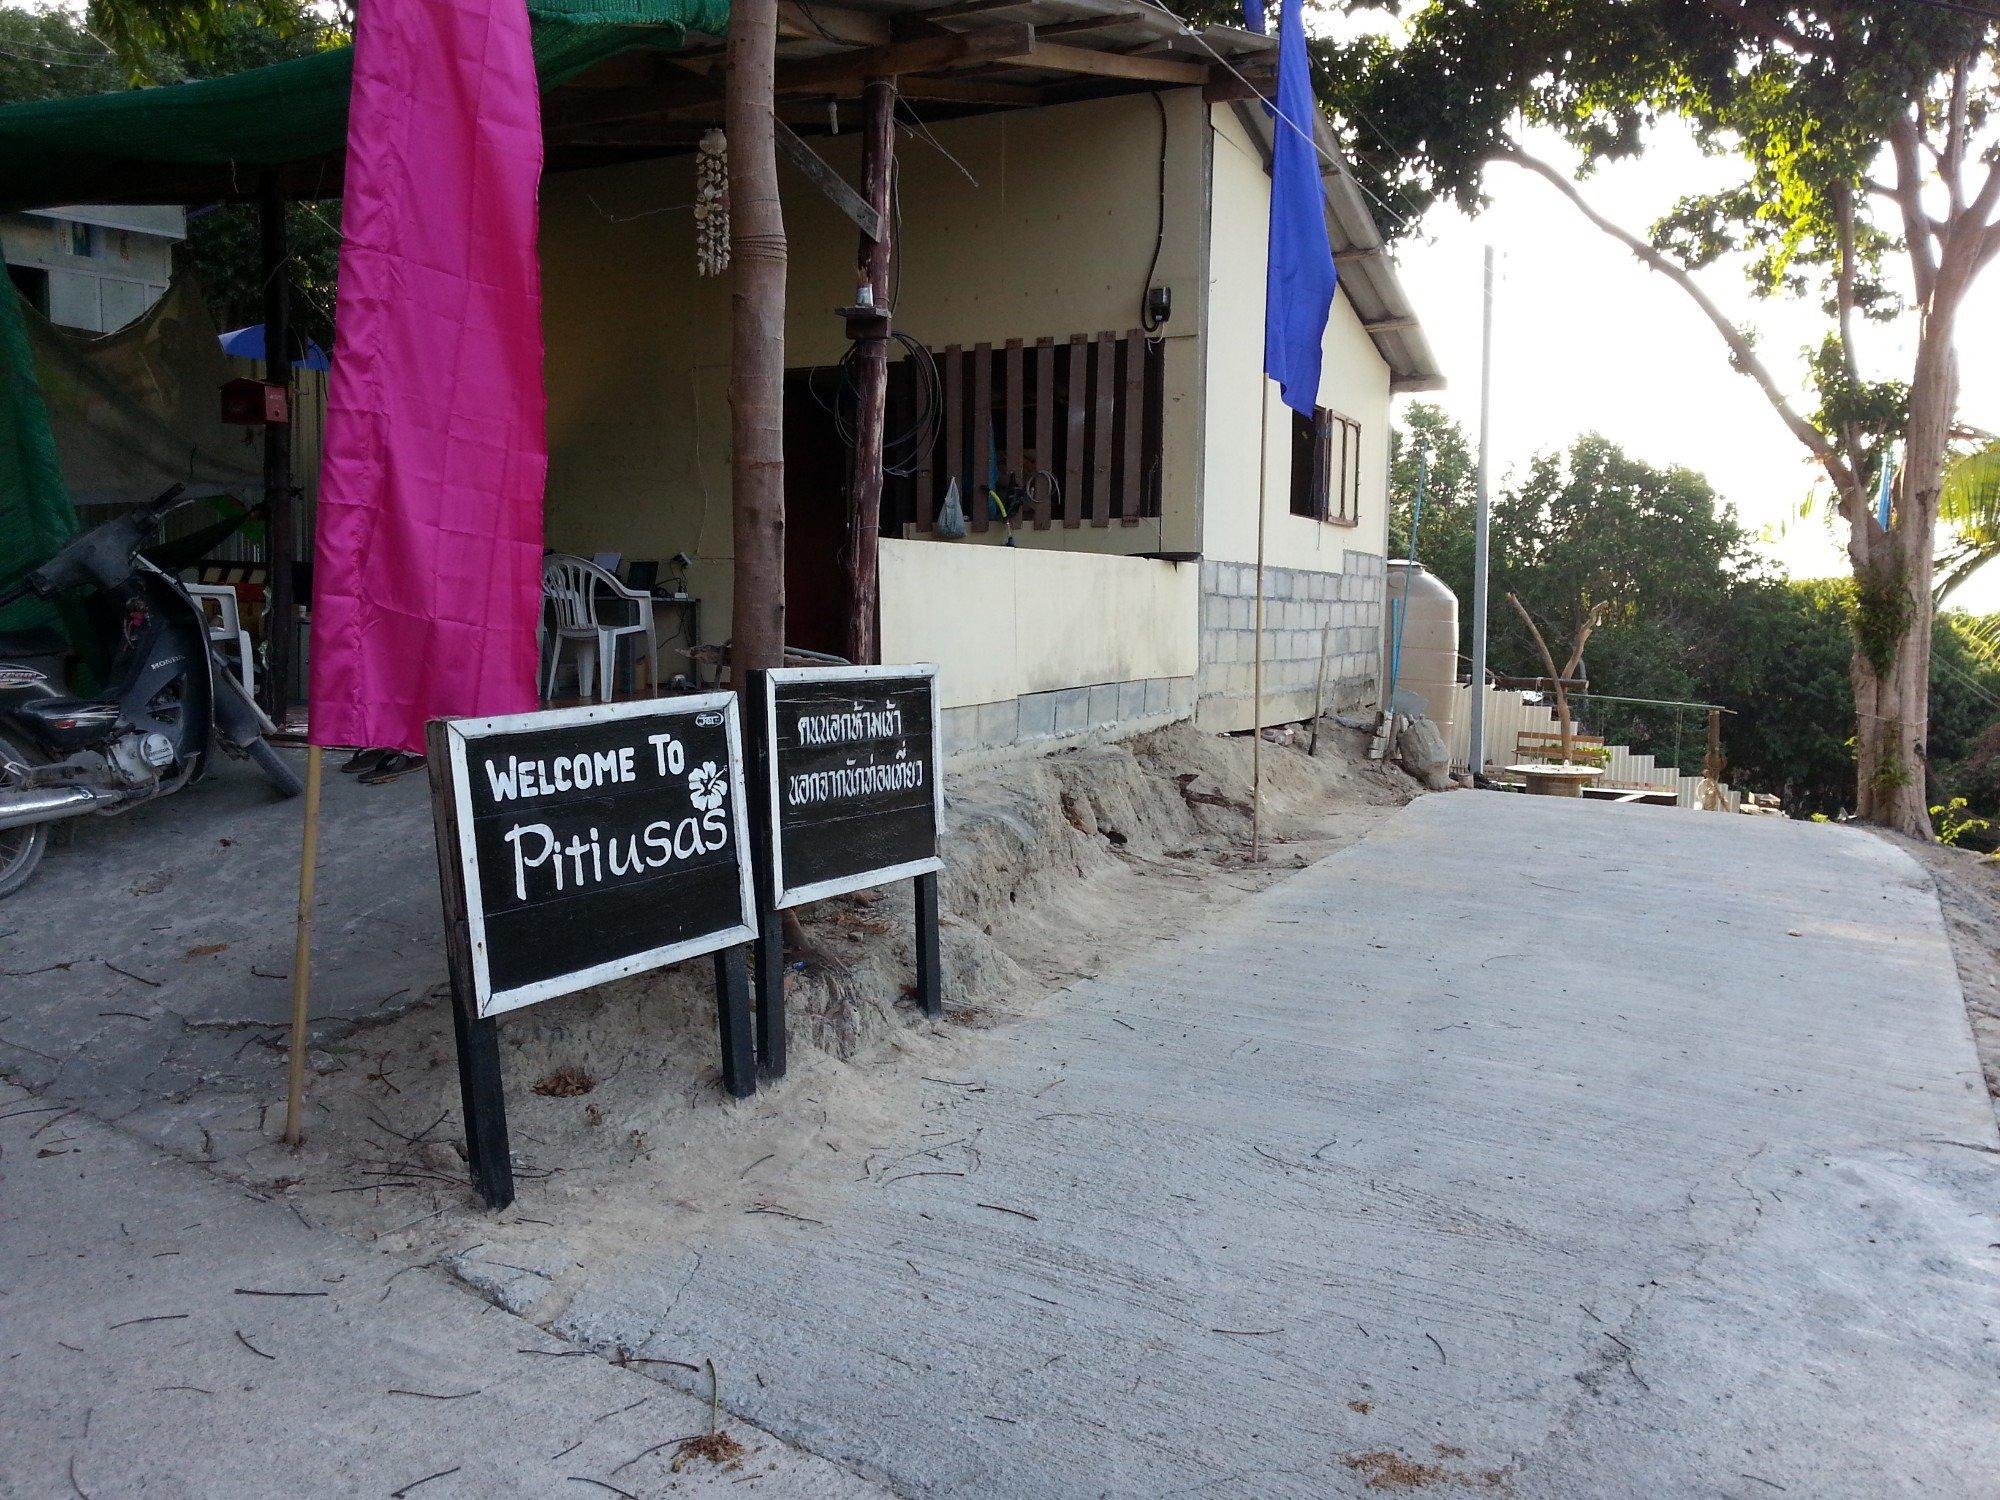 Entrance to Pitiusas Beach